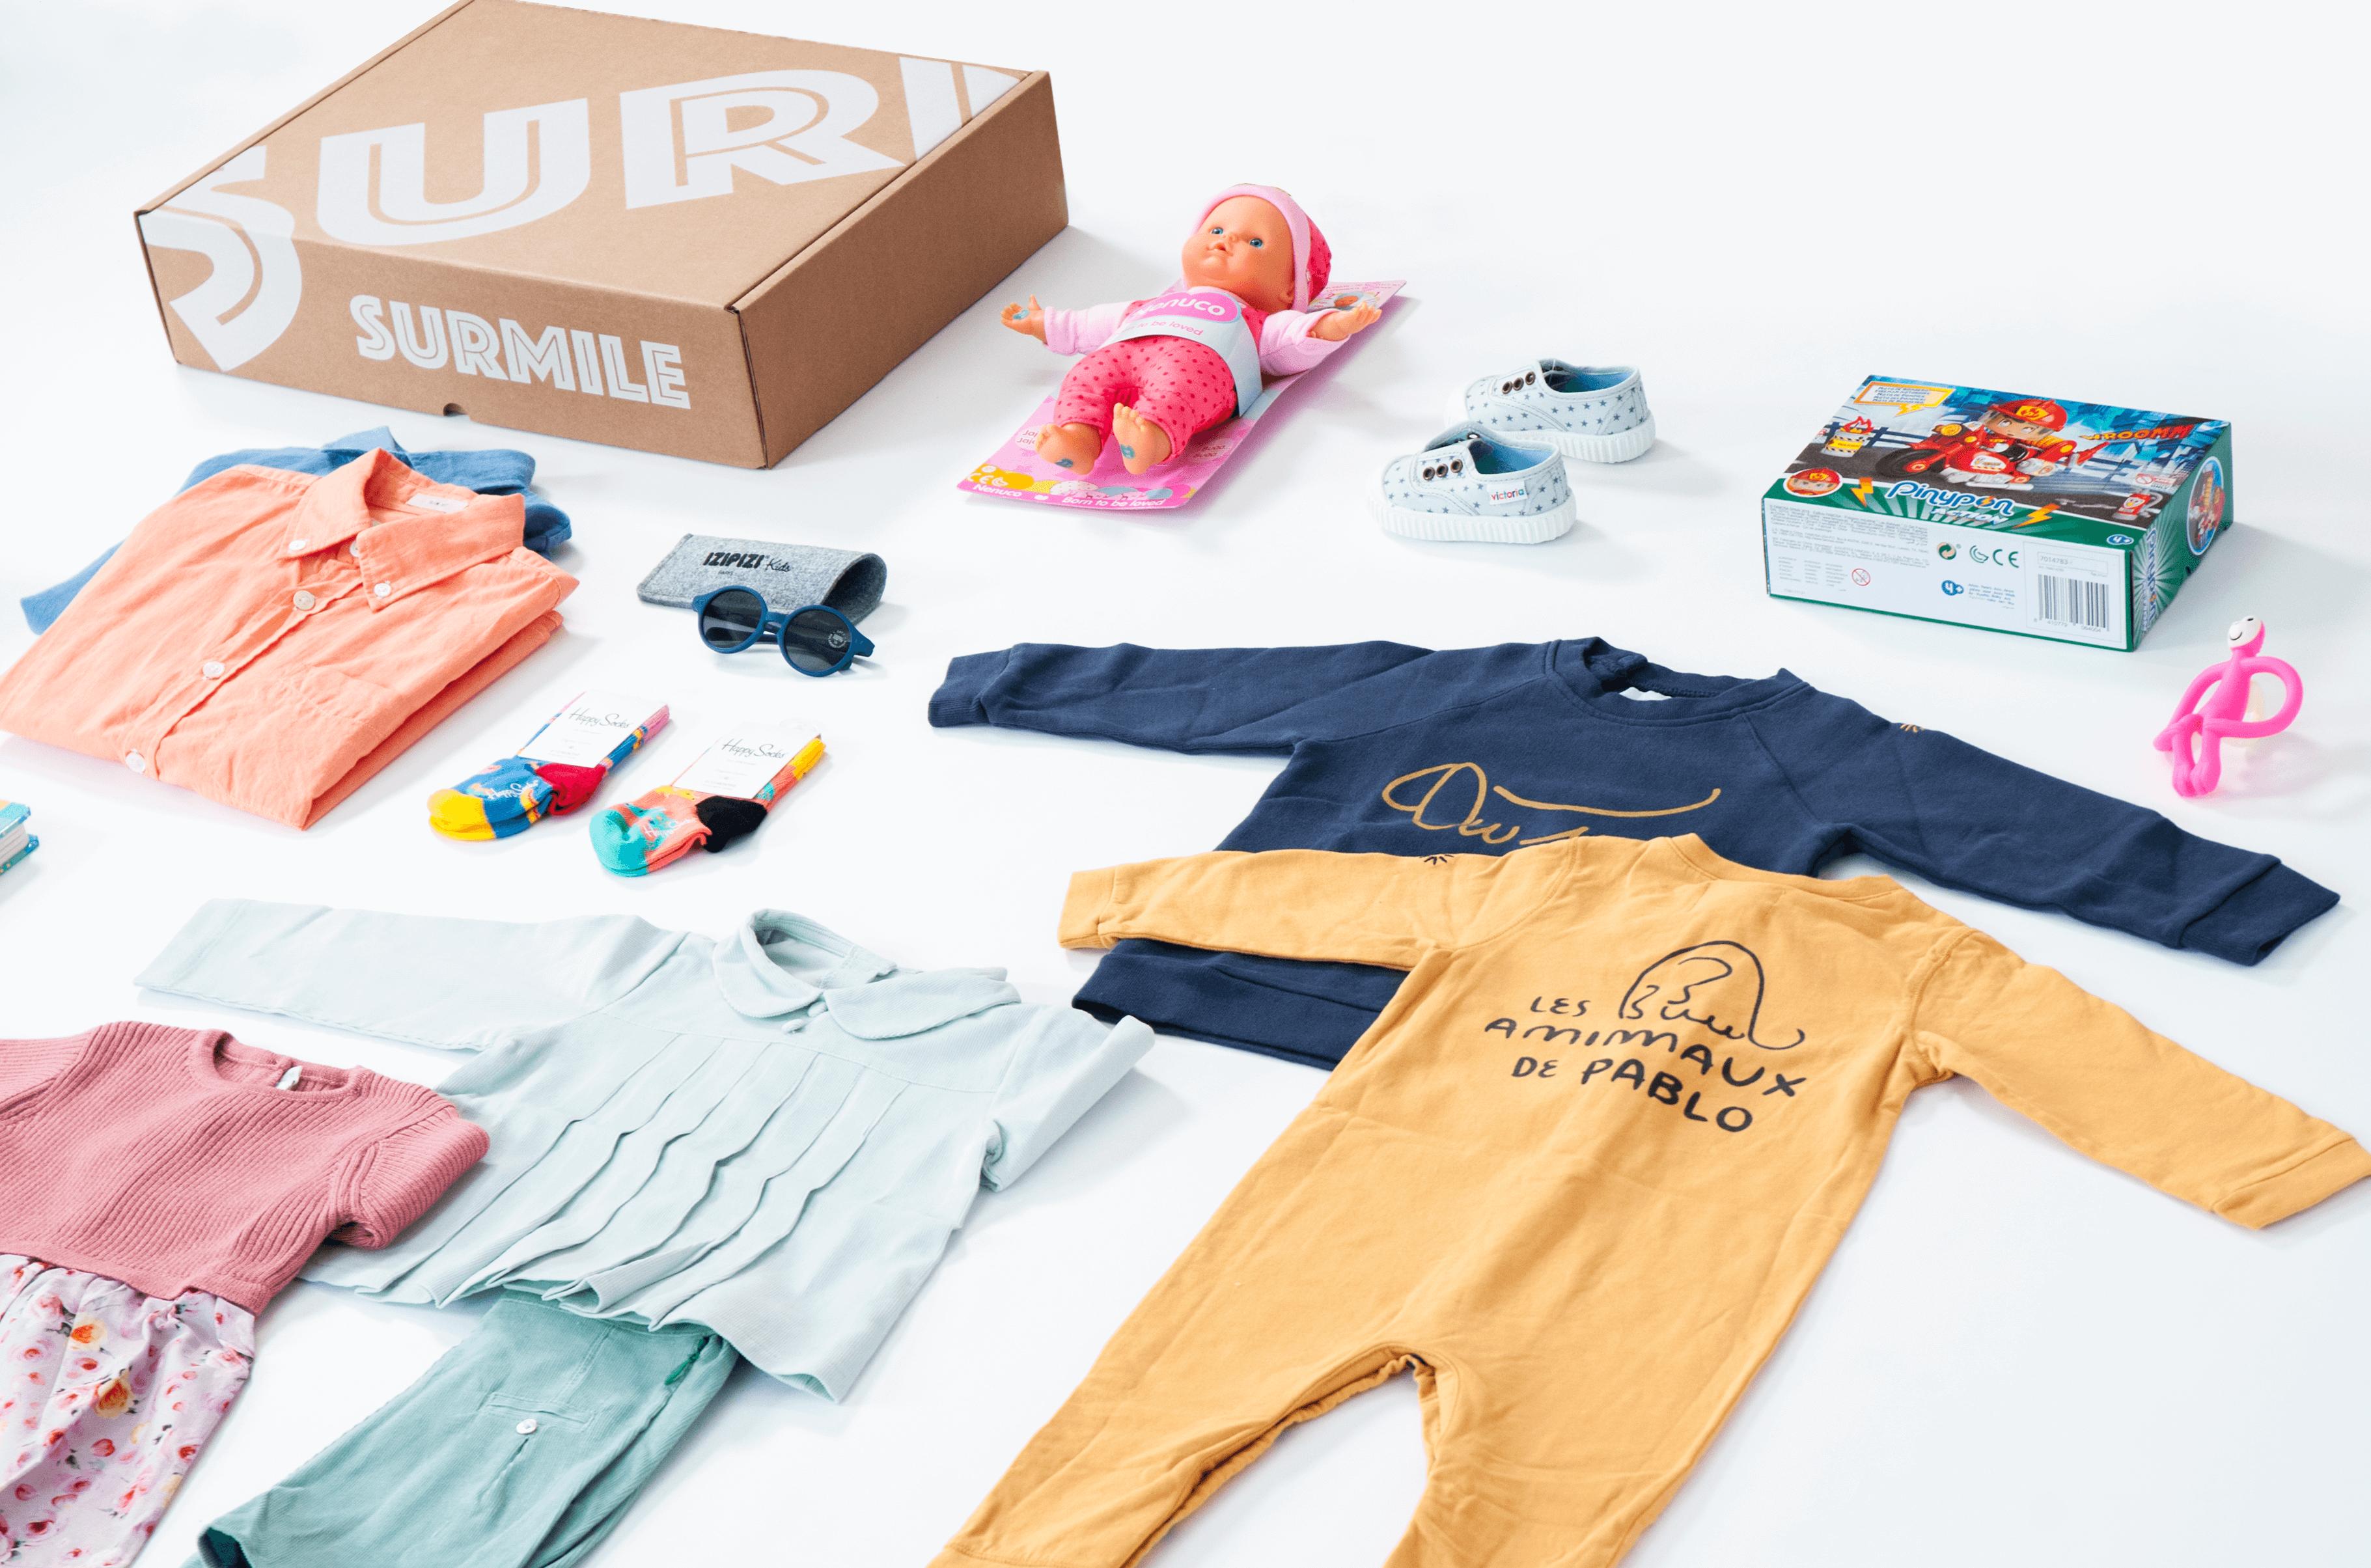 Caja de cartón de Surmile junto a varias prendas de ropa para niños